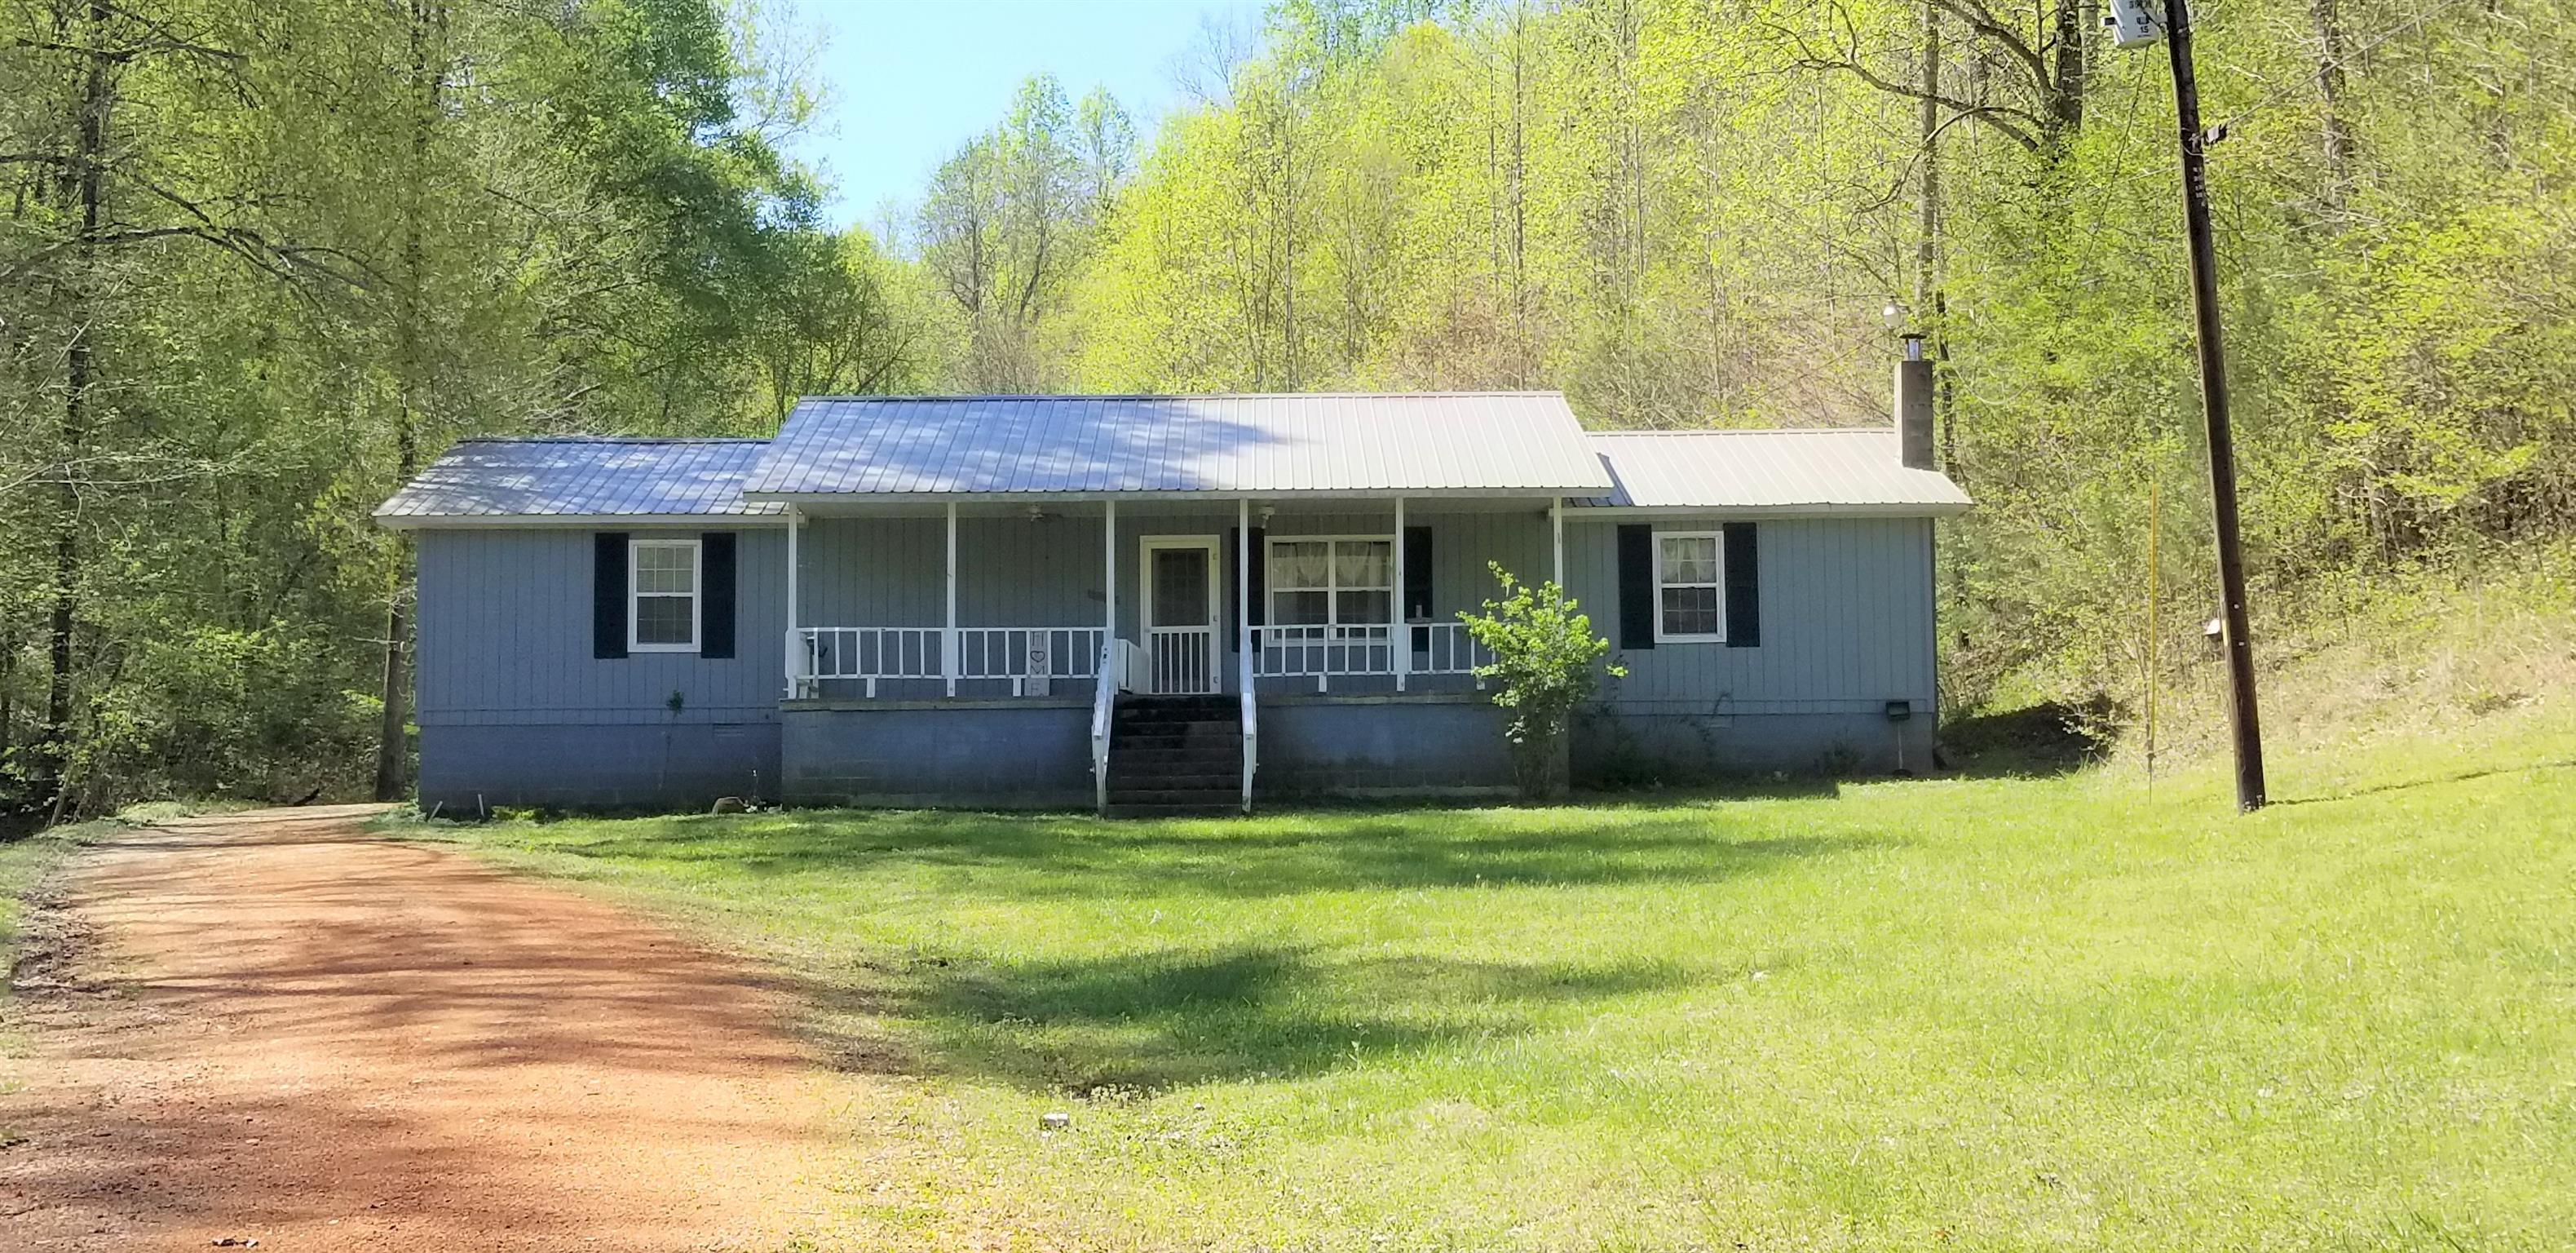 316 Anderson Rd, Linden, TN 37096 - Linden, TN real estate listing